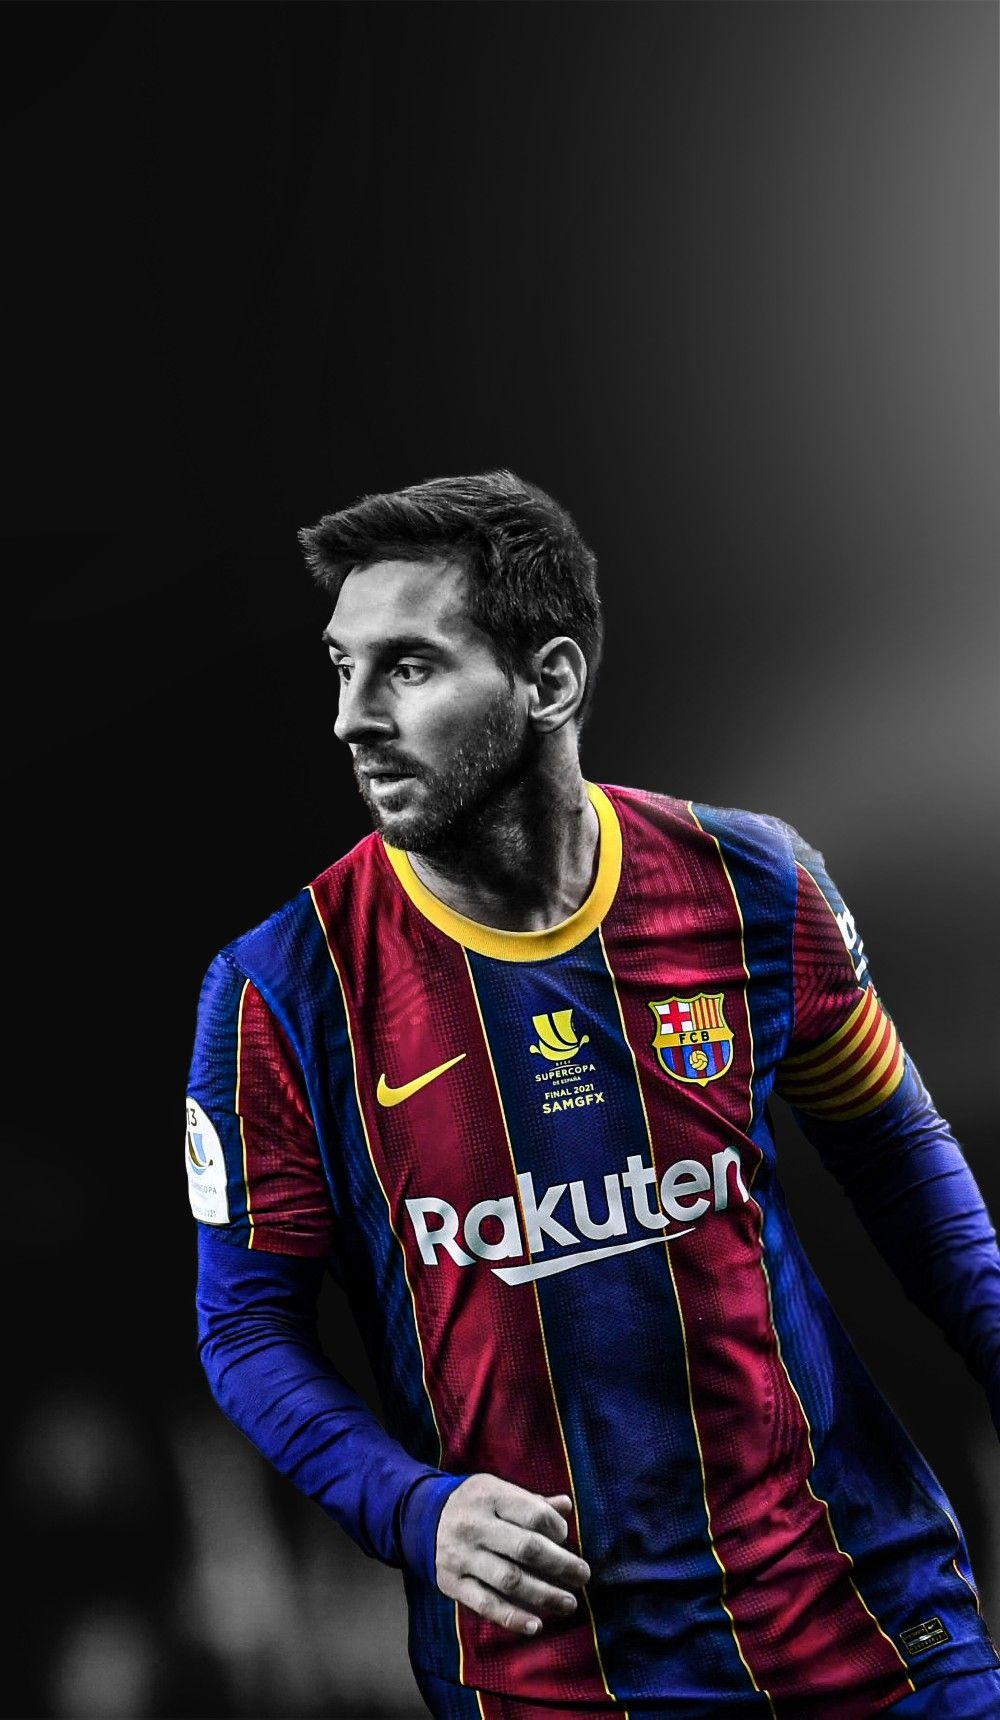 Leo Messi Di 2021 Lionel Messi Sepak Bola Messi